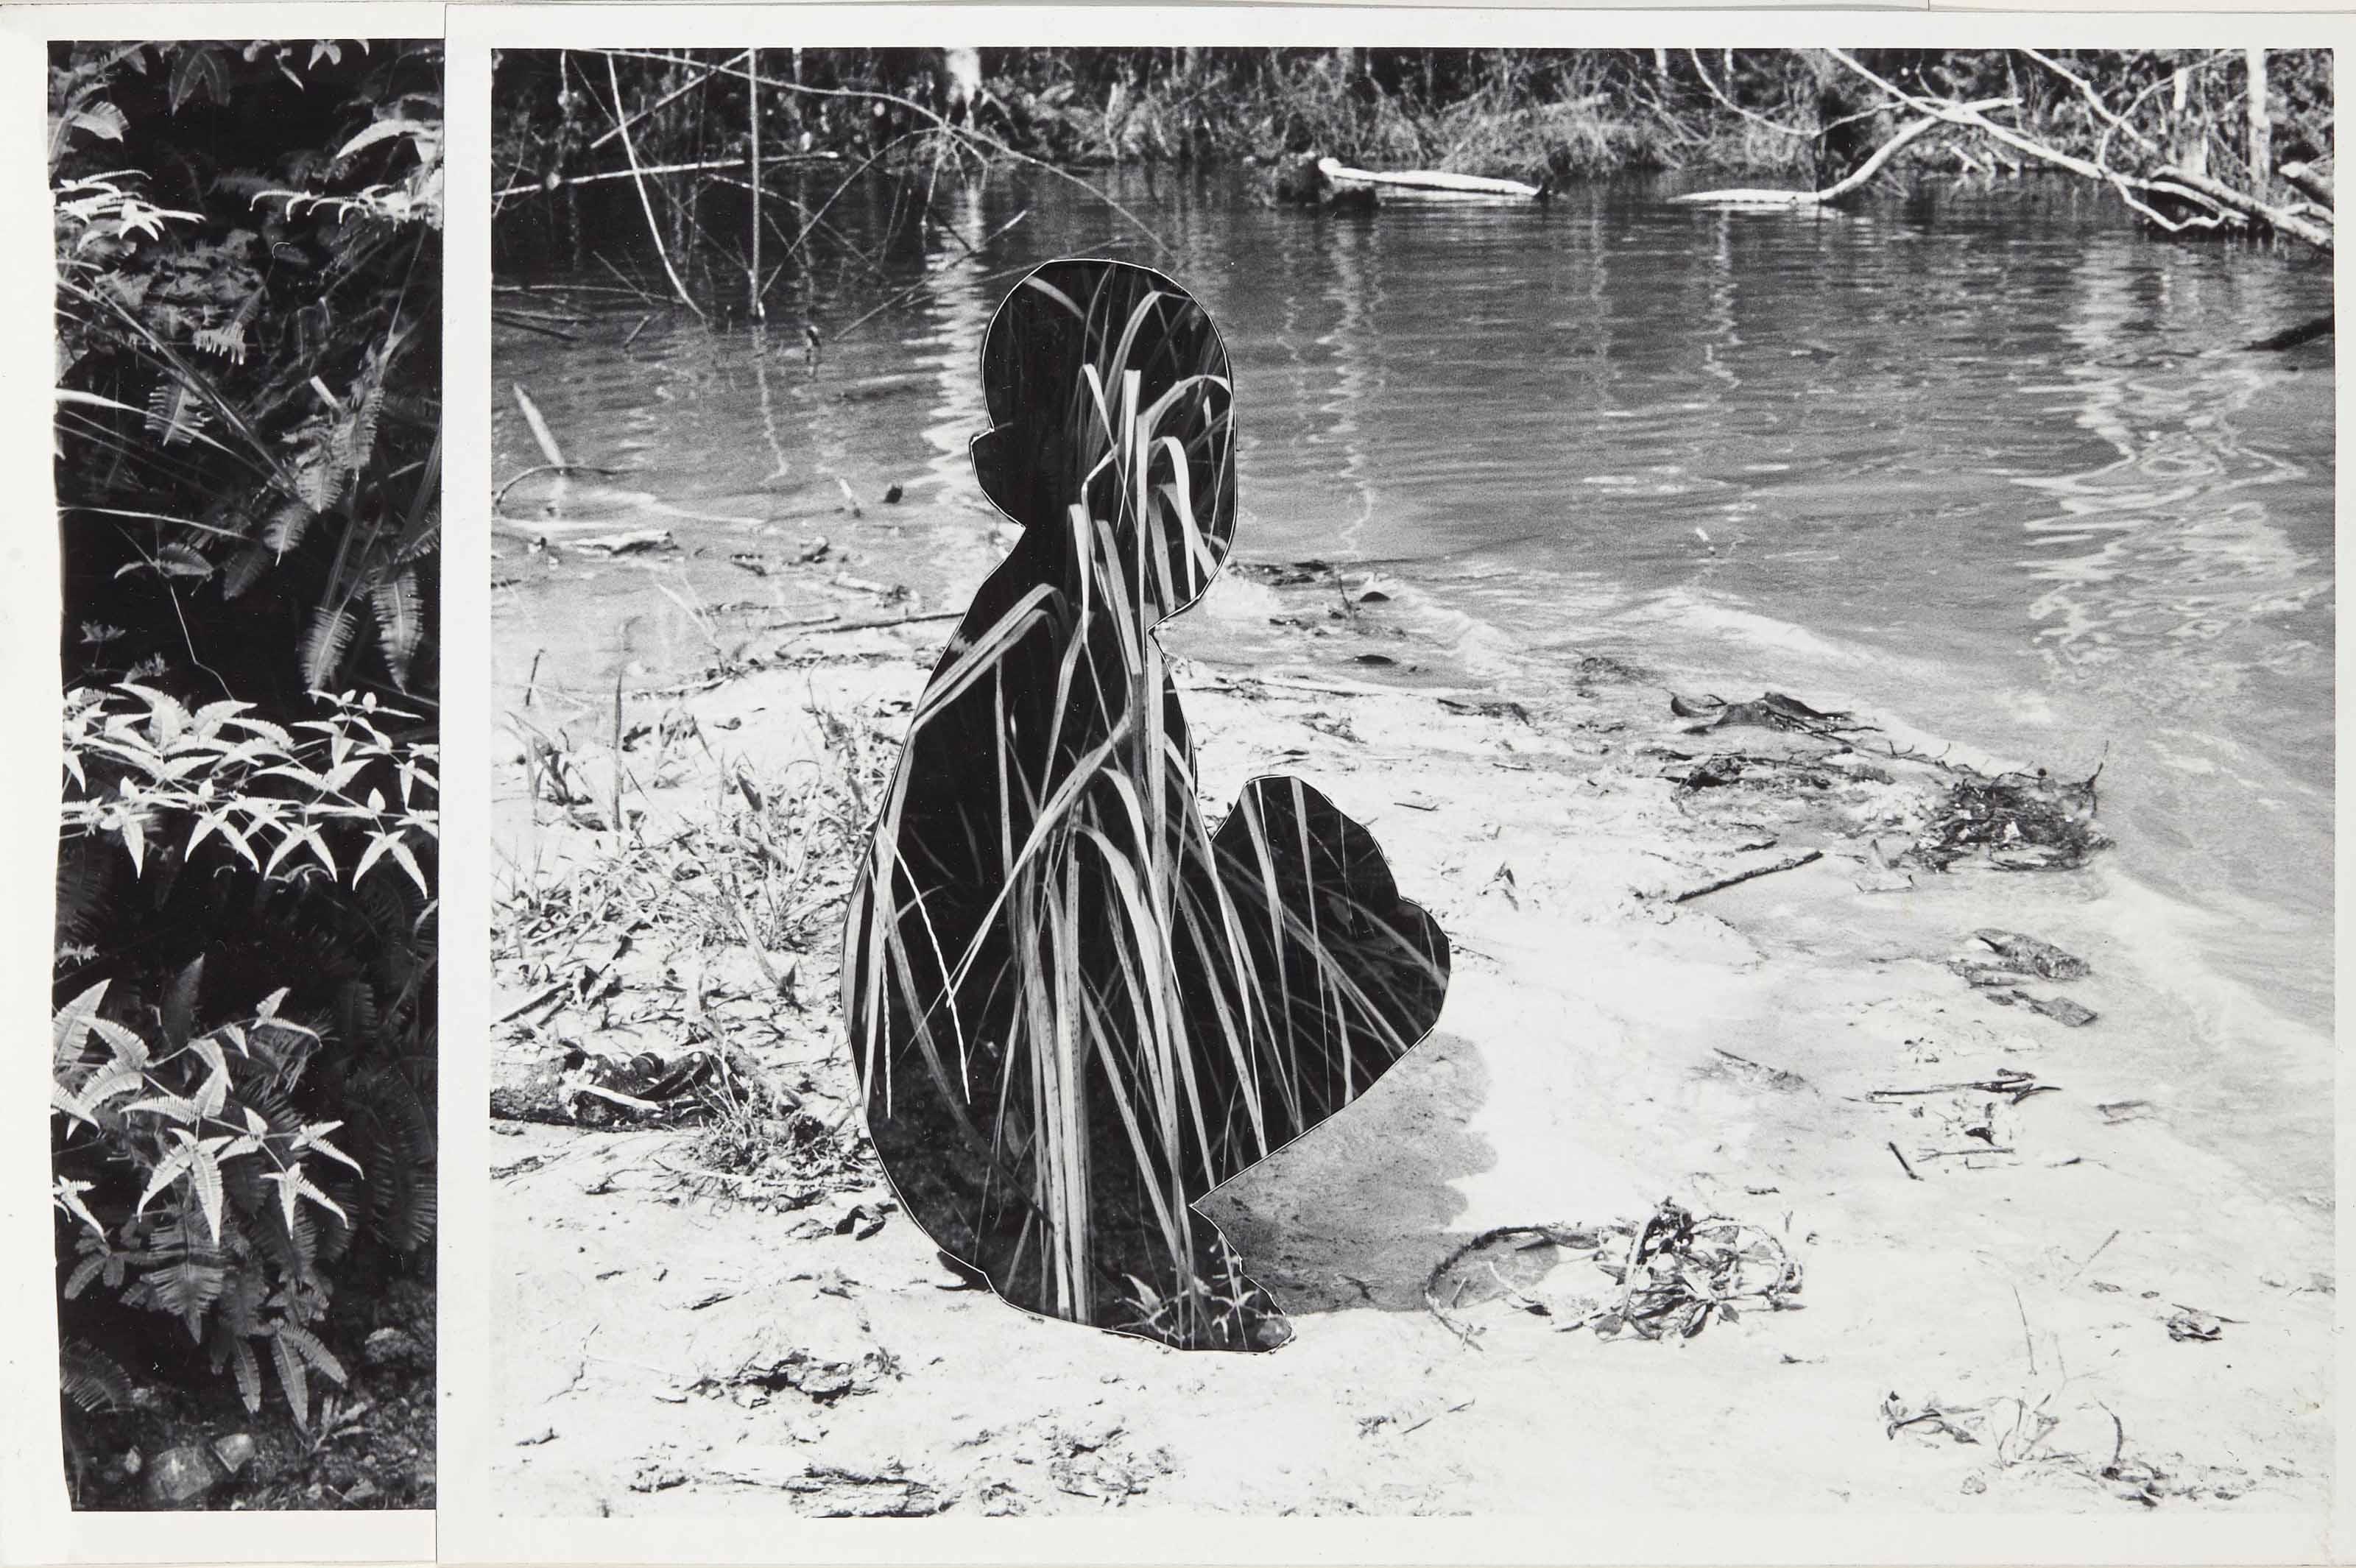 Adam Broomberg & Oliver Chanarin (b. 1970 & 1971)